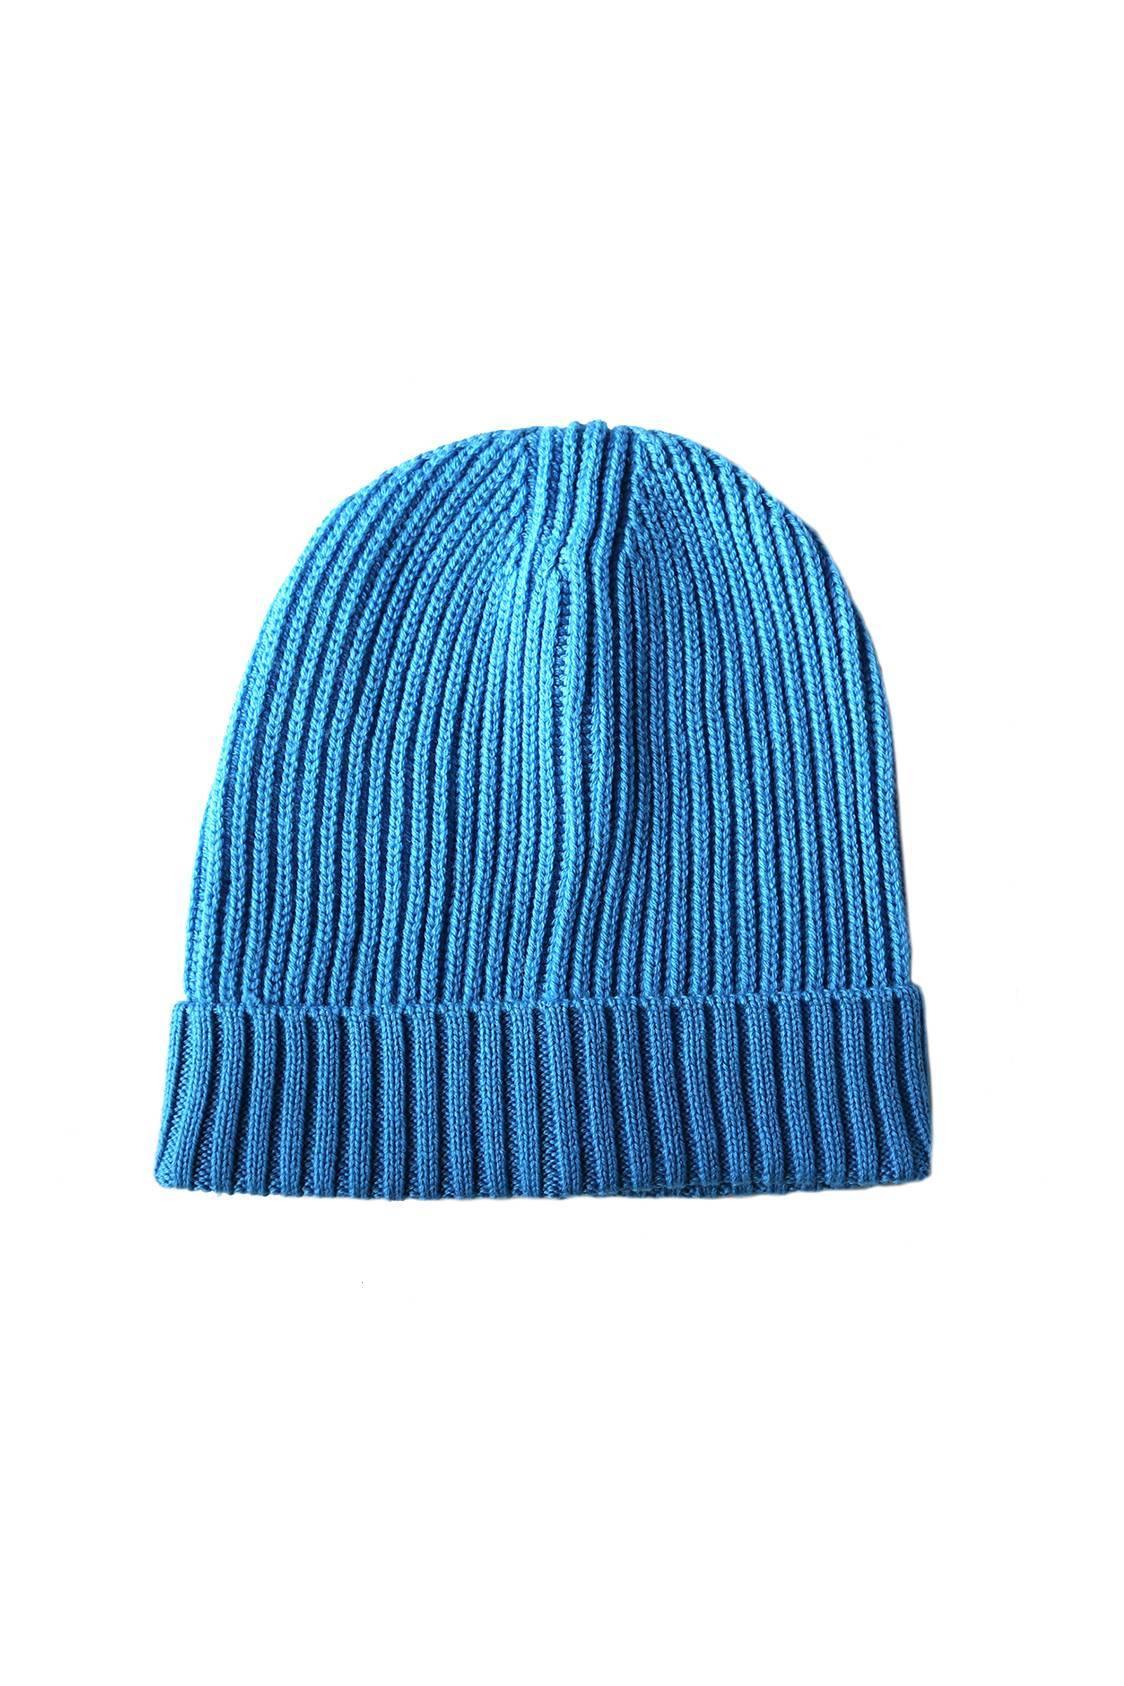 Cardigan Knit Hat